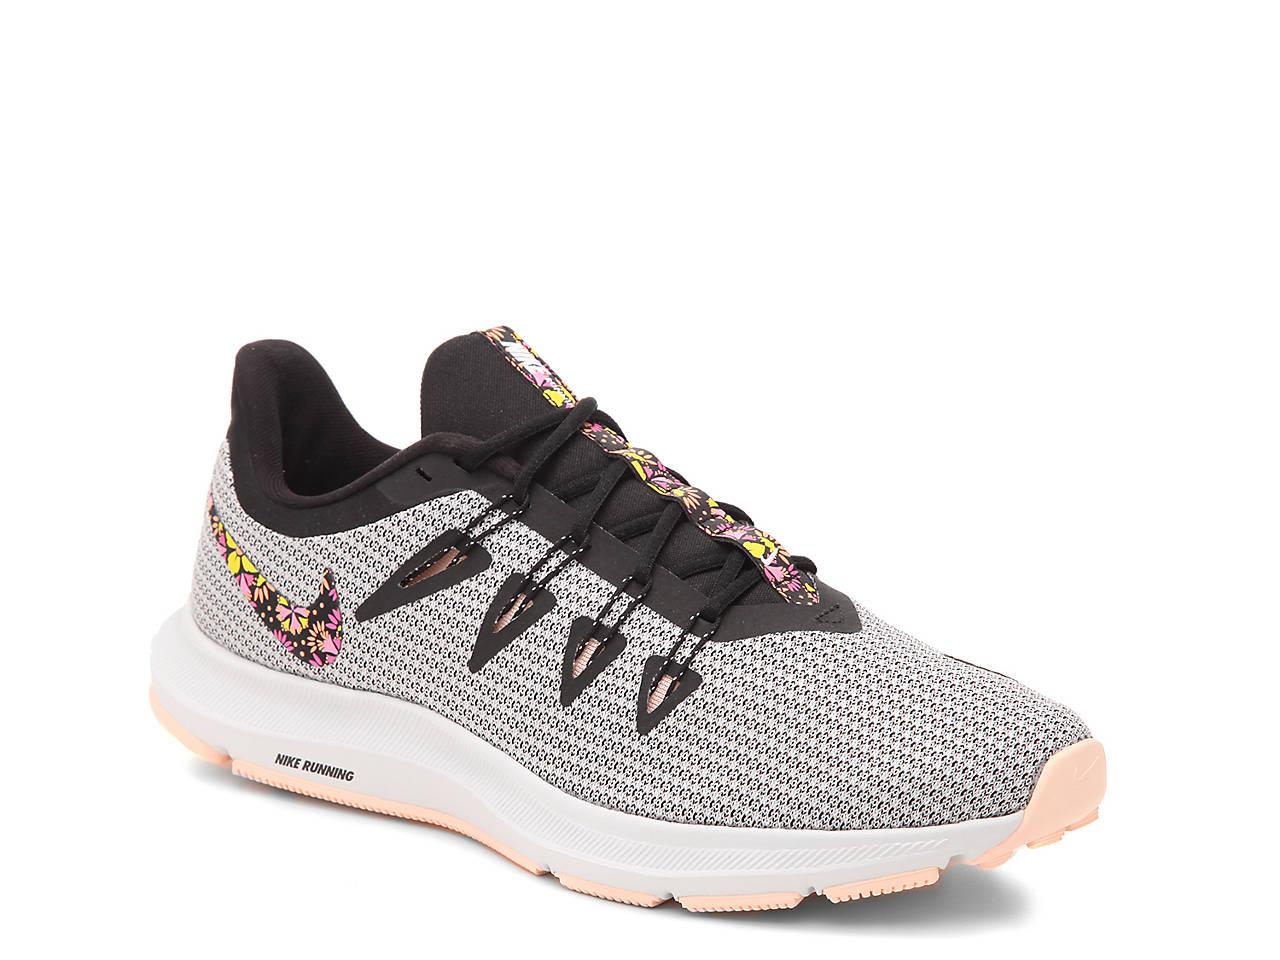 6d0b84e7c Nike Quest Lightweight Running Shoe - Women's Women's Shoes | DSW